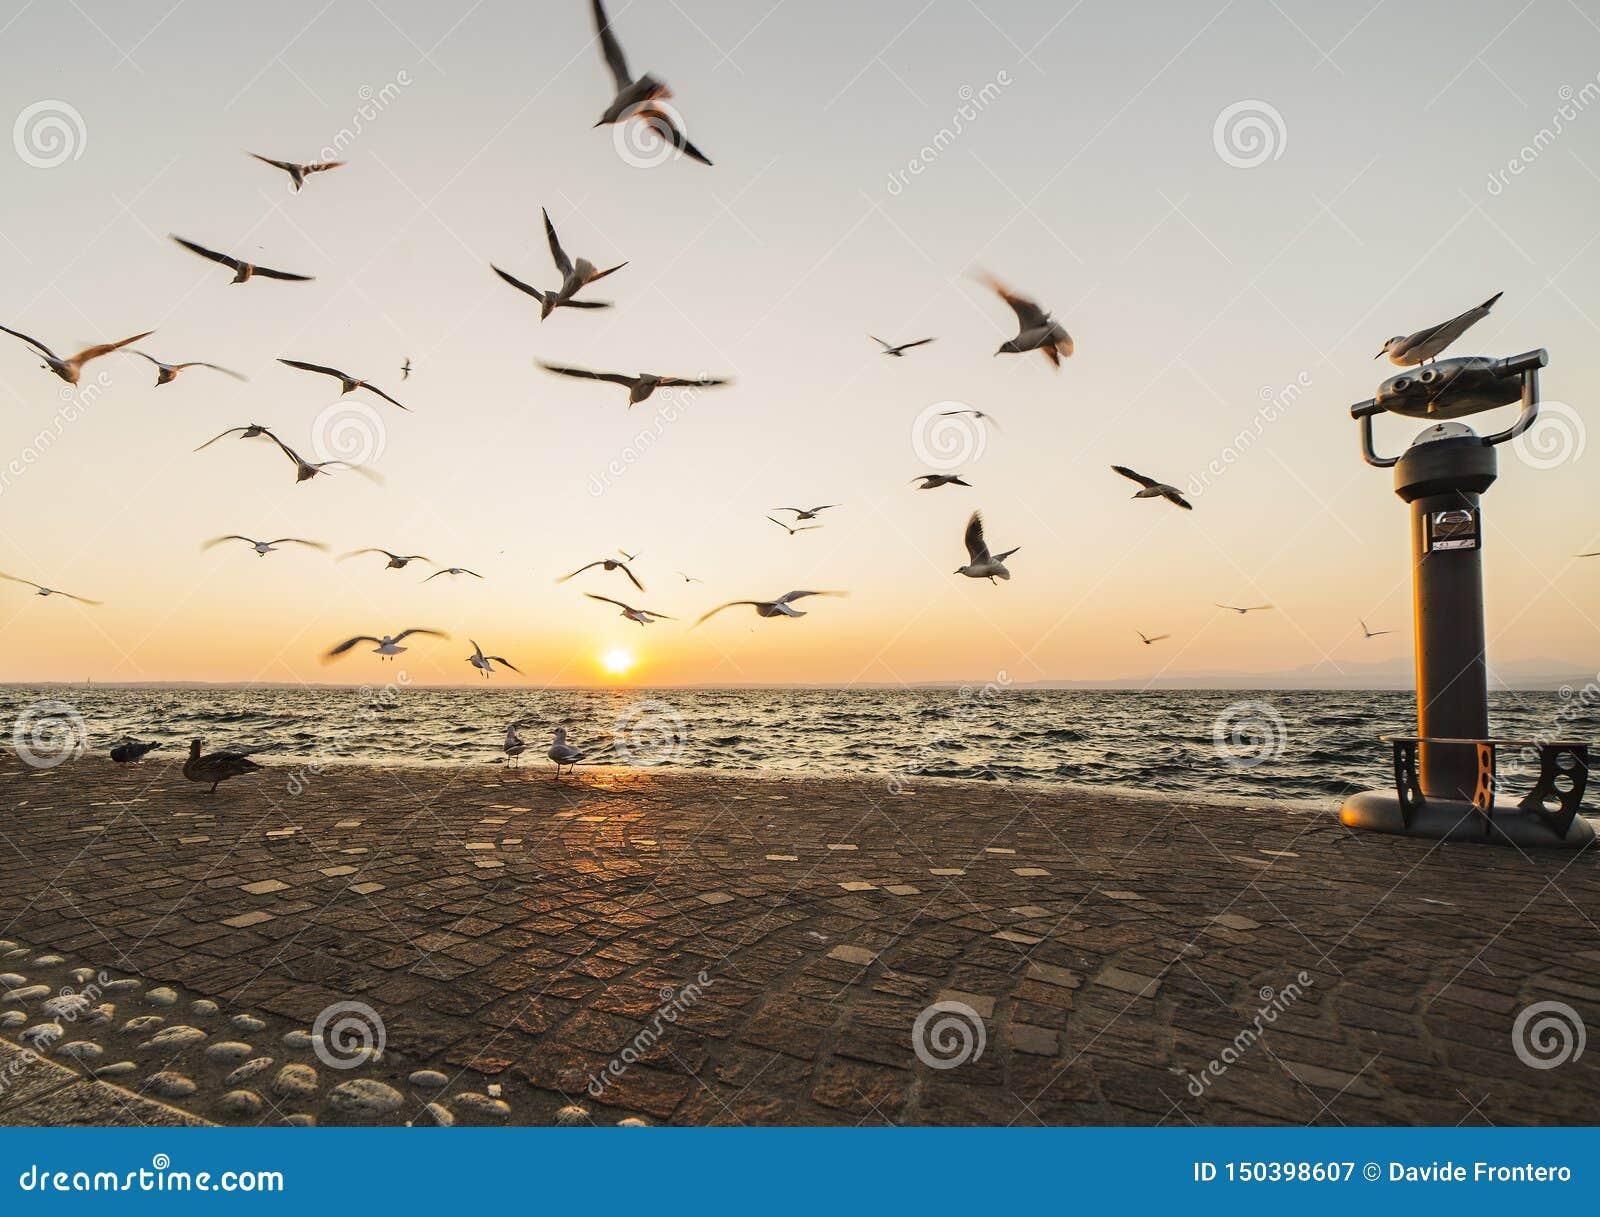 Seagull flight on sky over lake garda